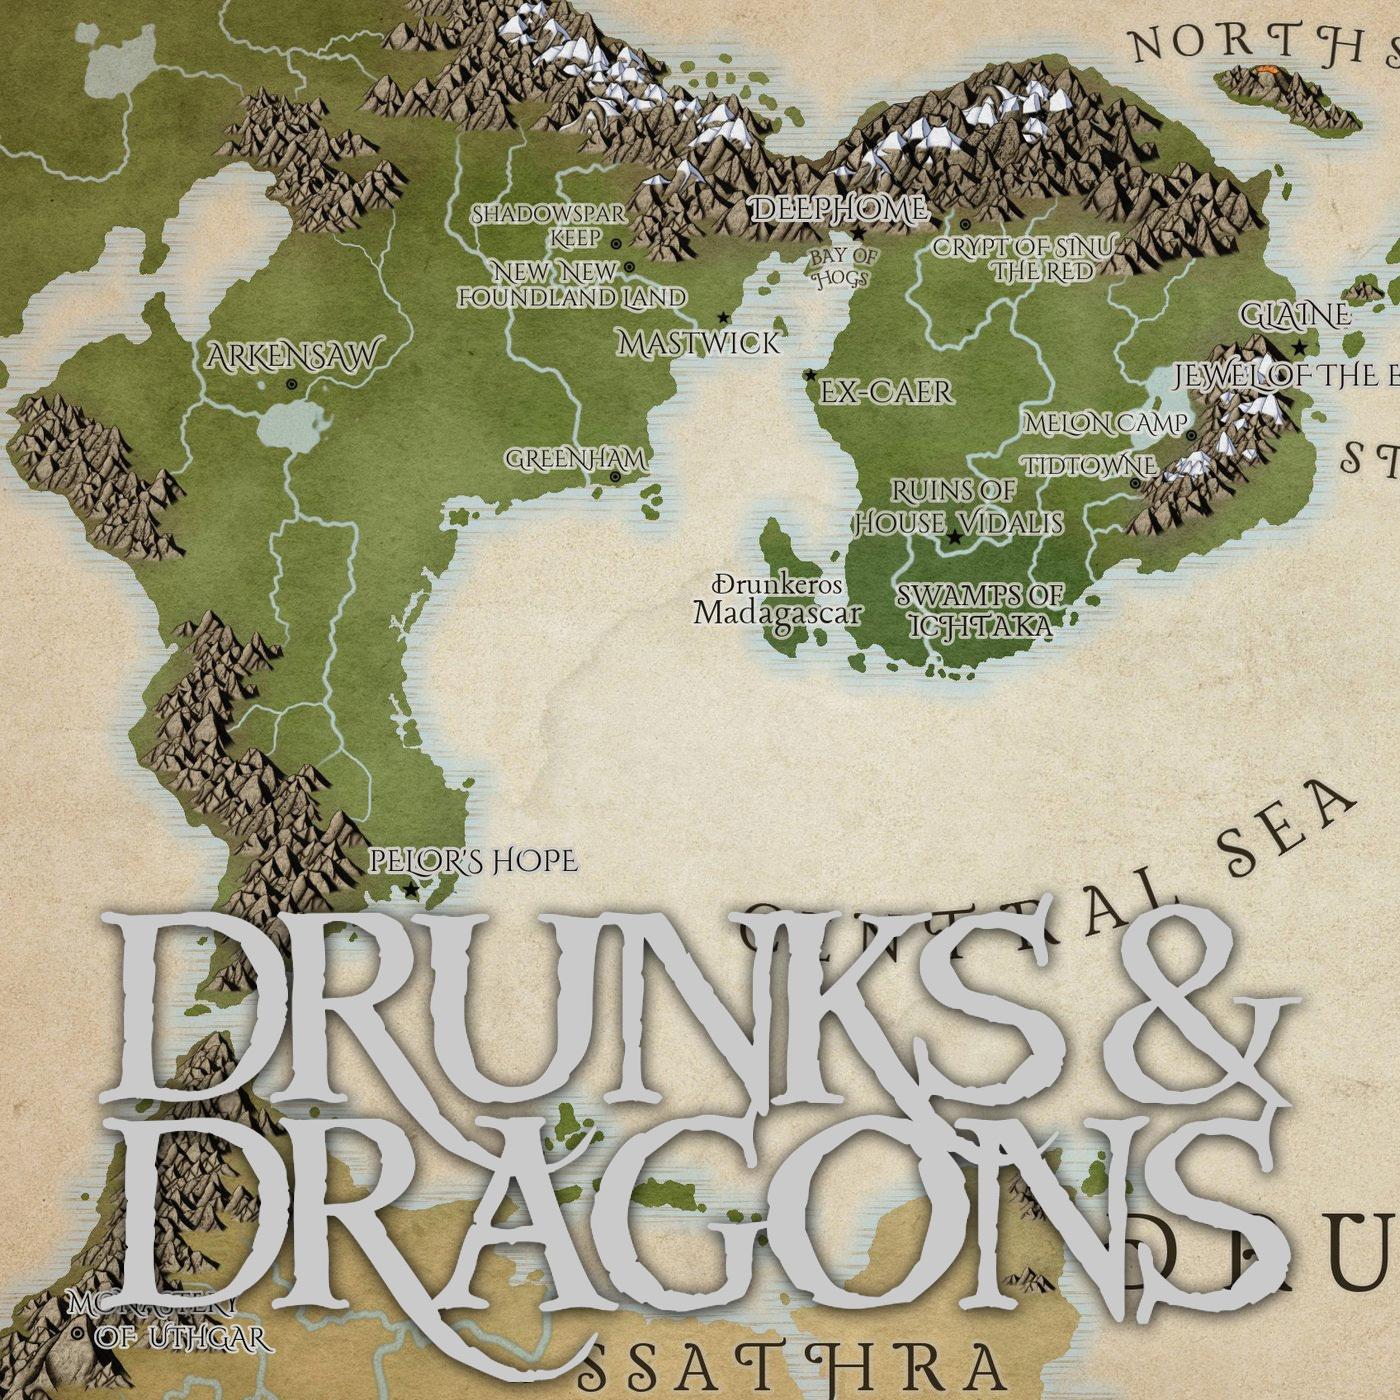 Episode 309 - A Maze for You, Dear Drakoolus